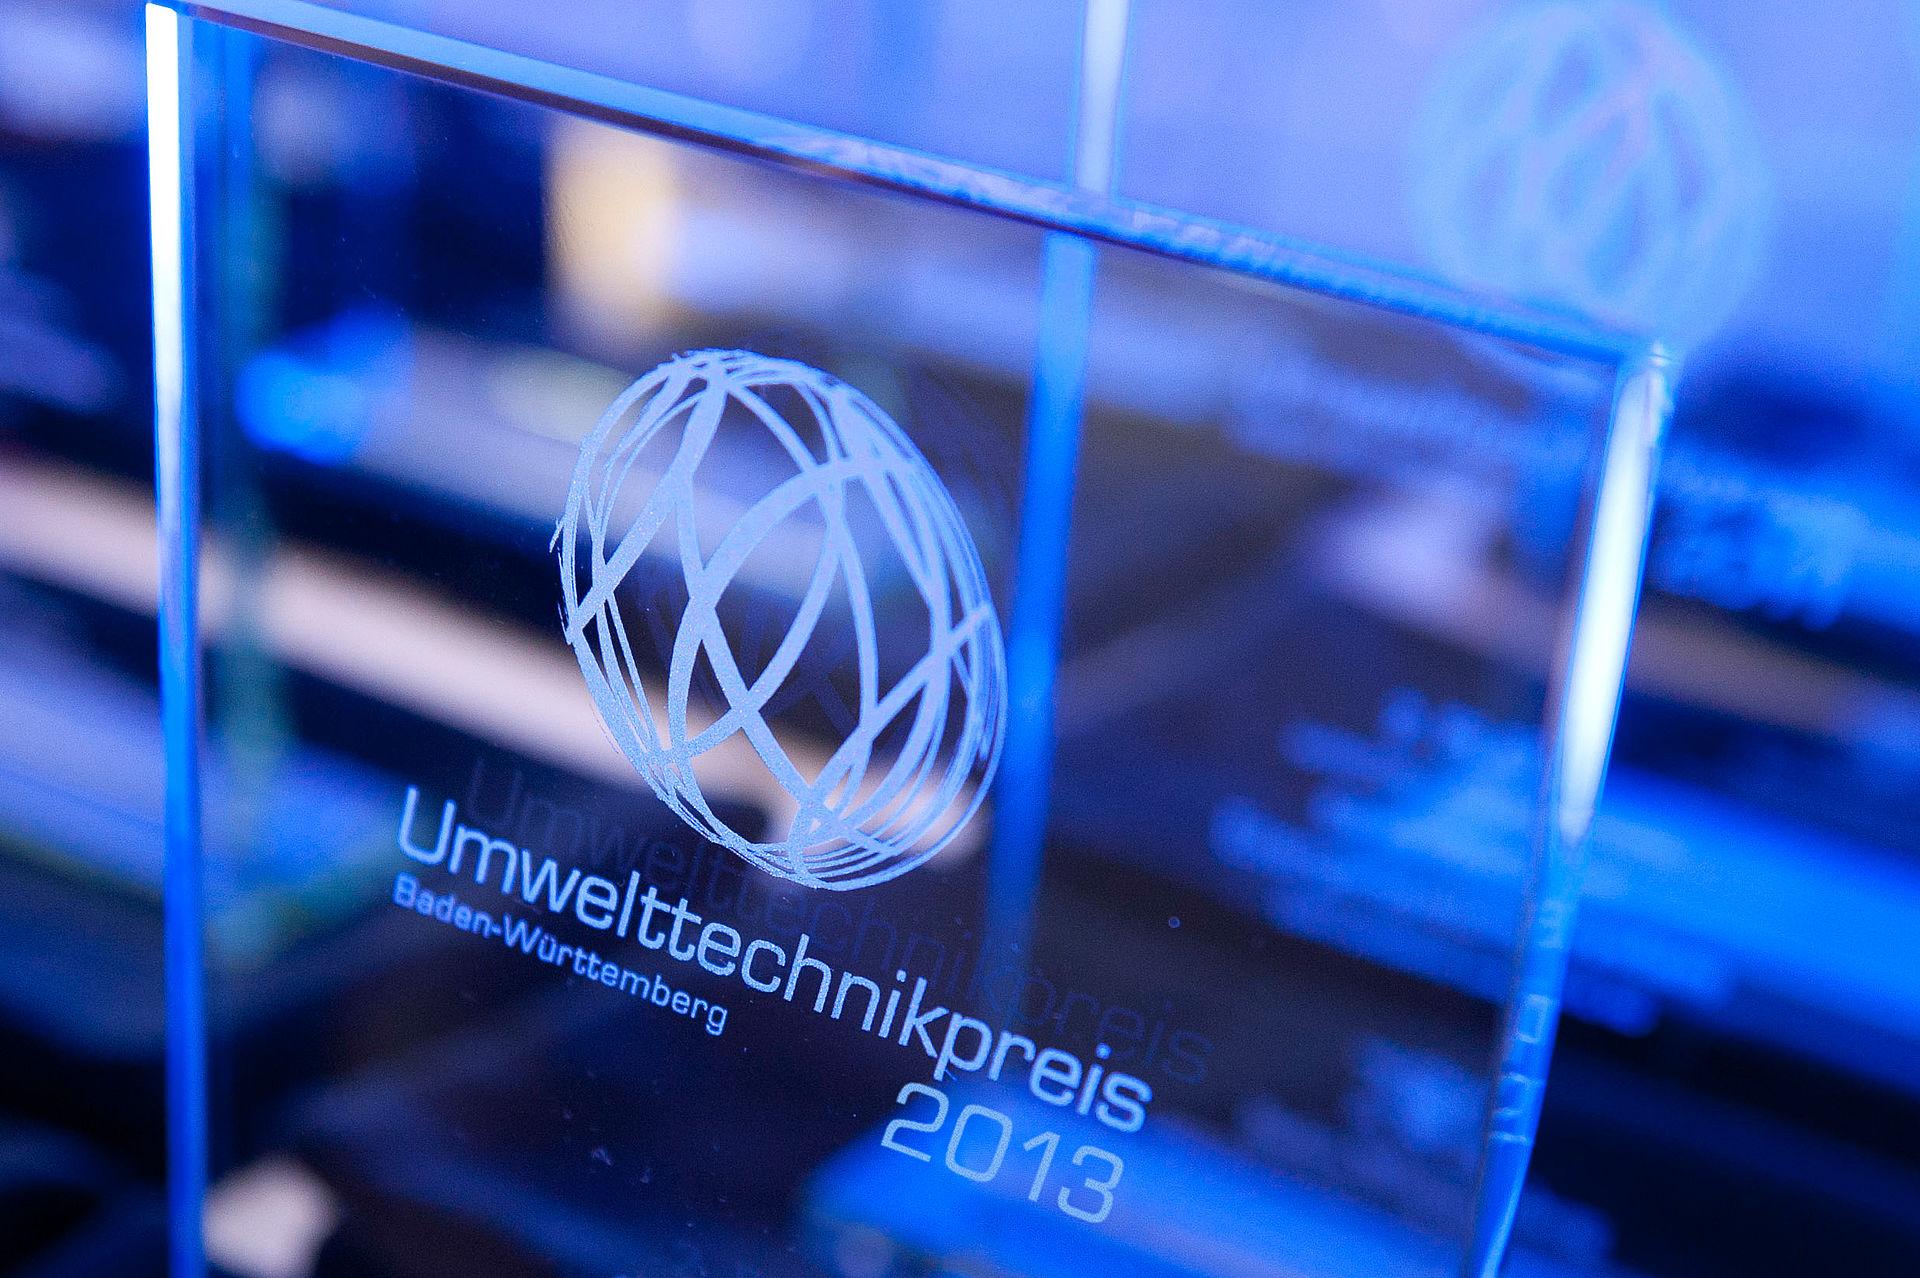 Umwelttechnikpreis Baden Württemberg 2013 Protektor